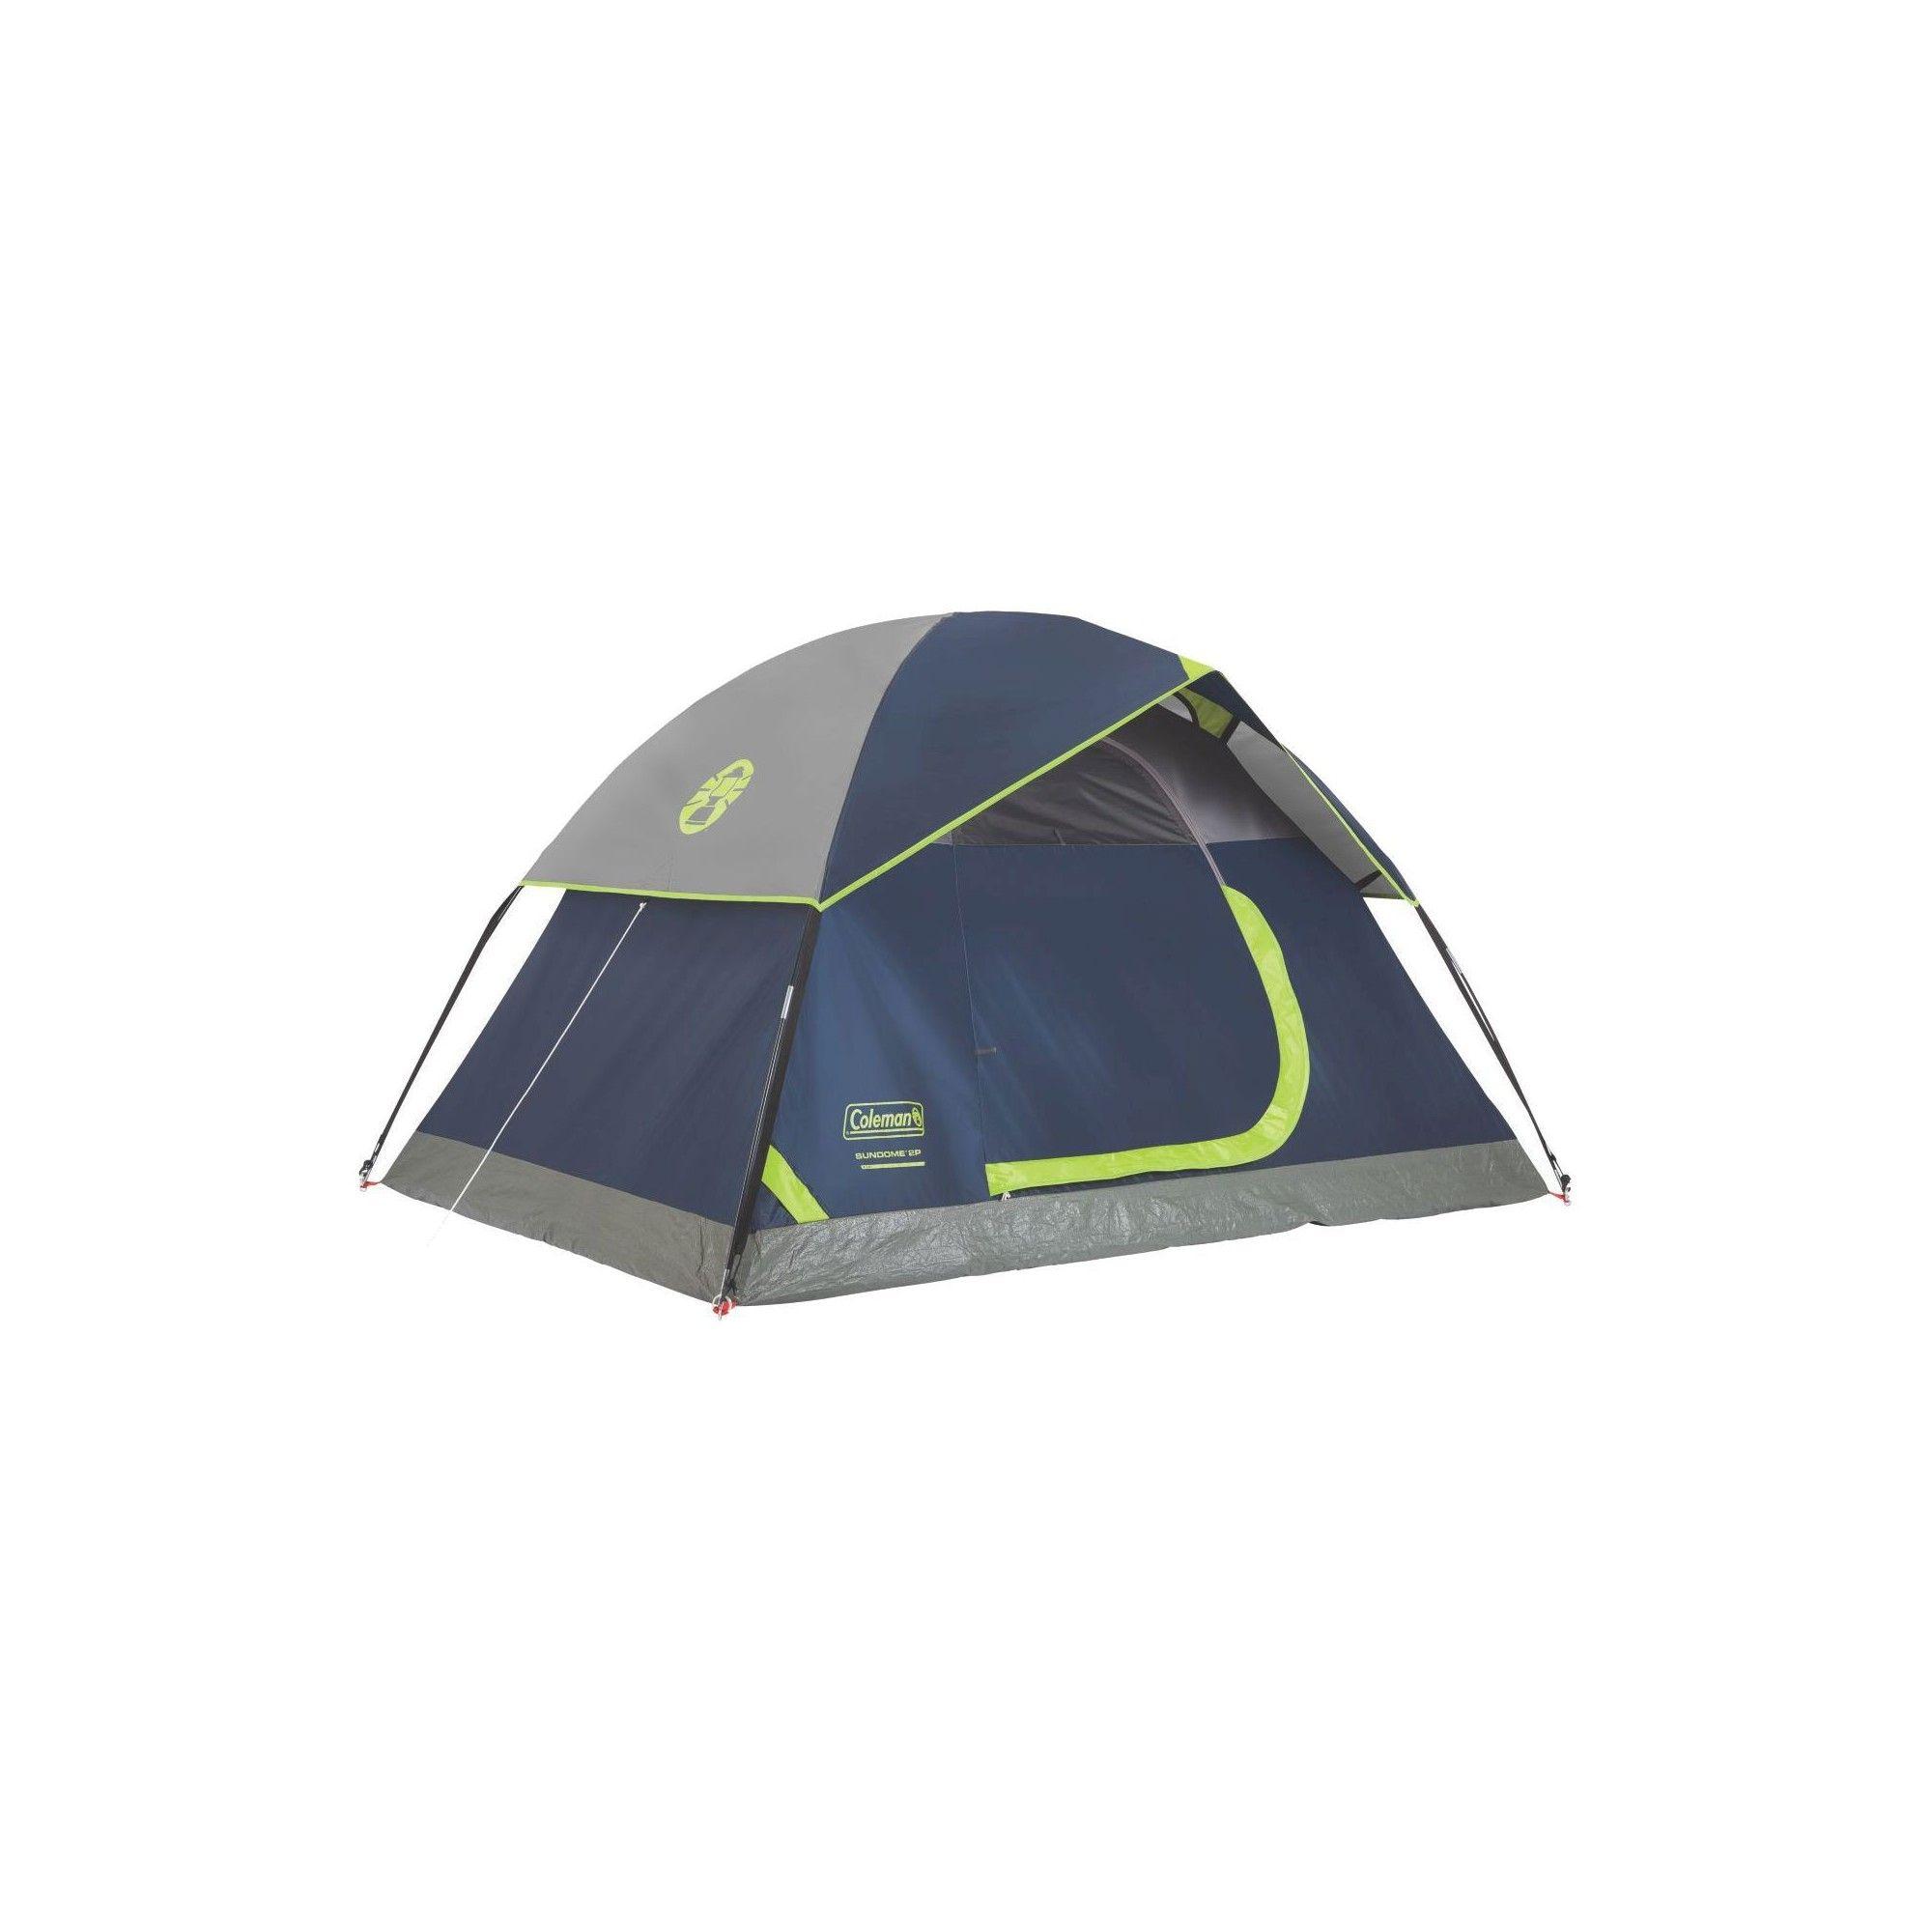 Coleman Sundome 2-Person Dome Tent - Navy Blue  sc 1 st  Pinterest & Coleman Sundome 2-Person Dome Tent - Navy Blue | Dome tent Tents ...